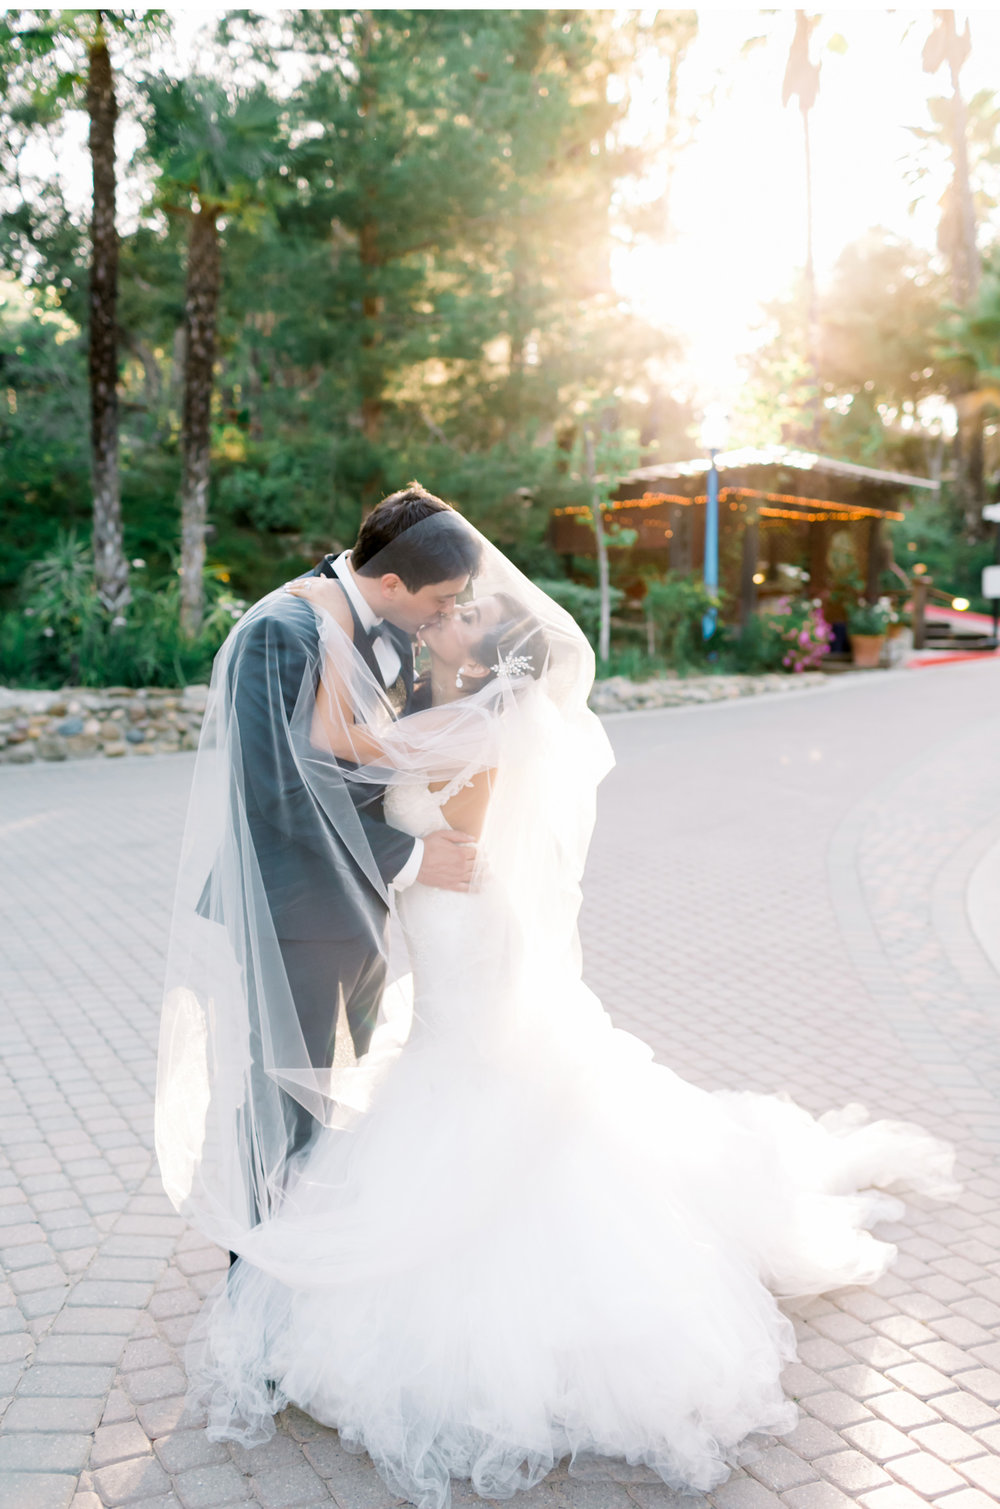 Kestrel-Park-Wedding-Natalie-Schutt-Photography_19.jpg